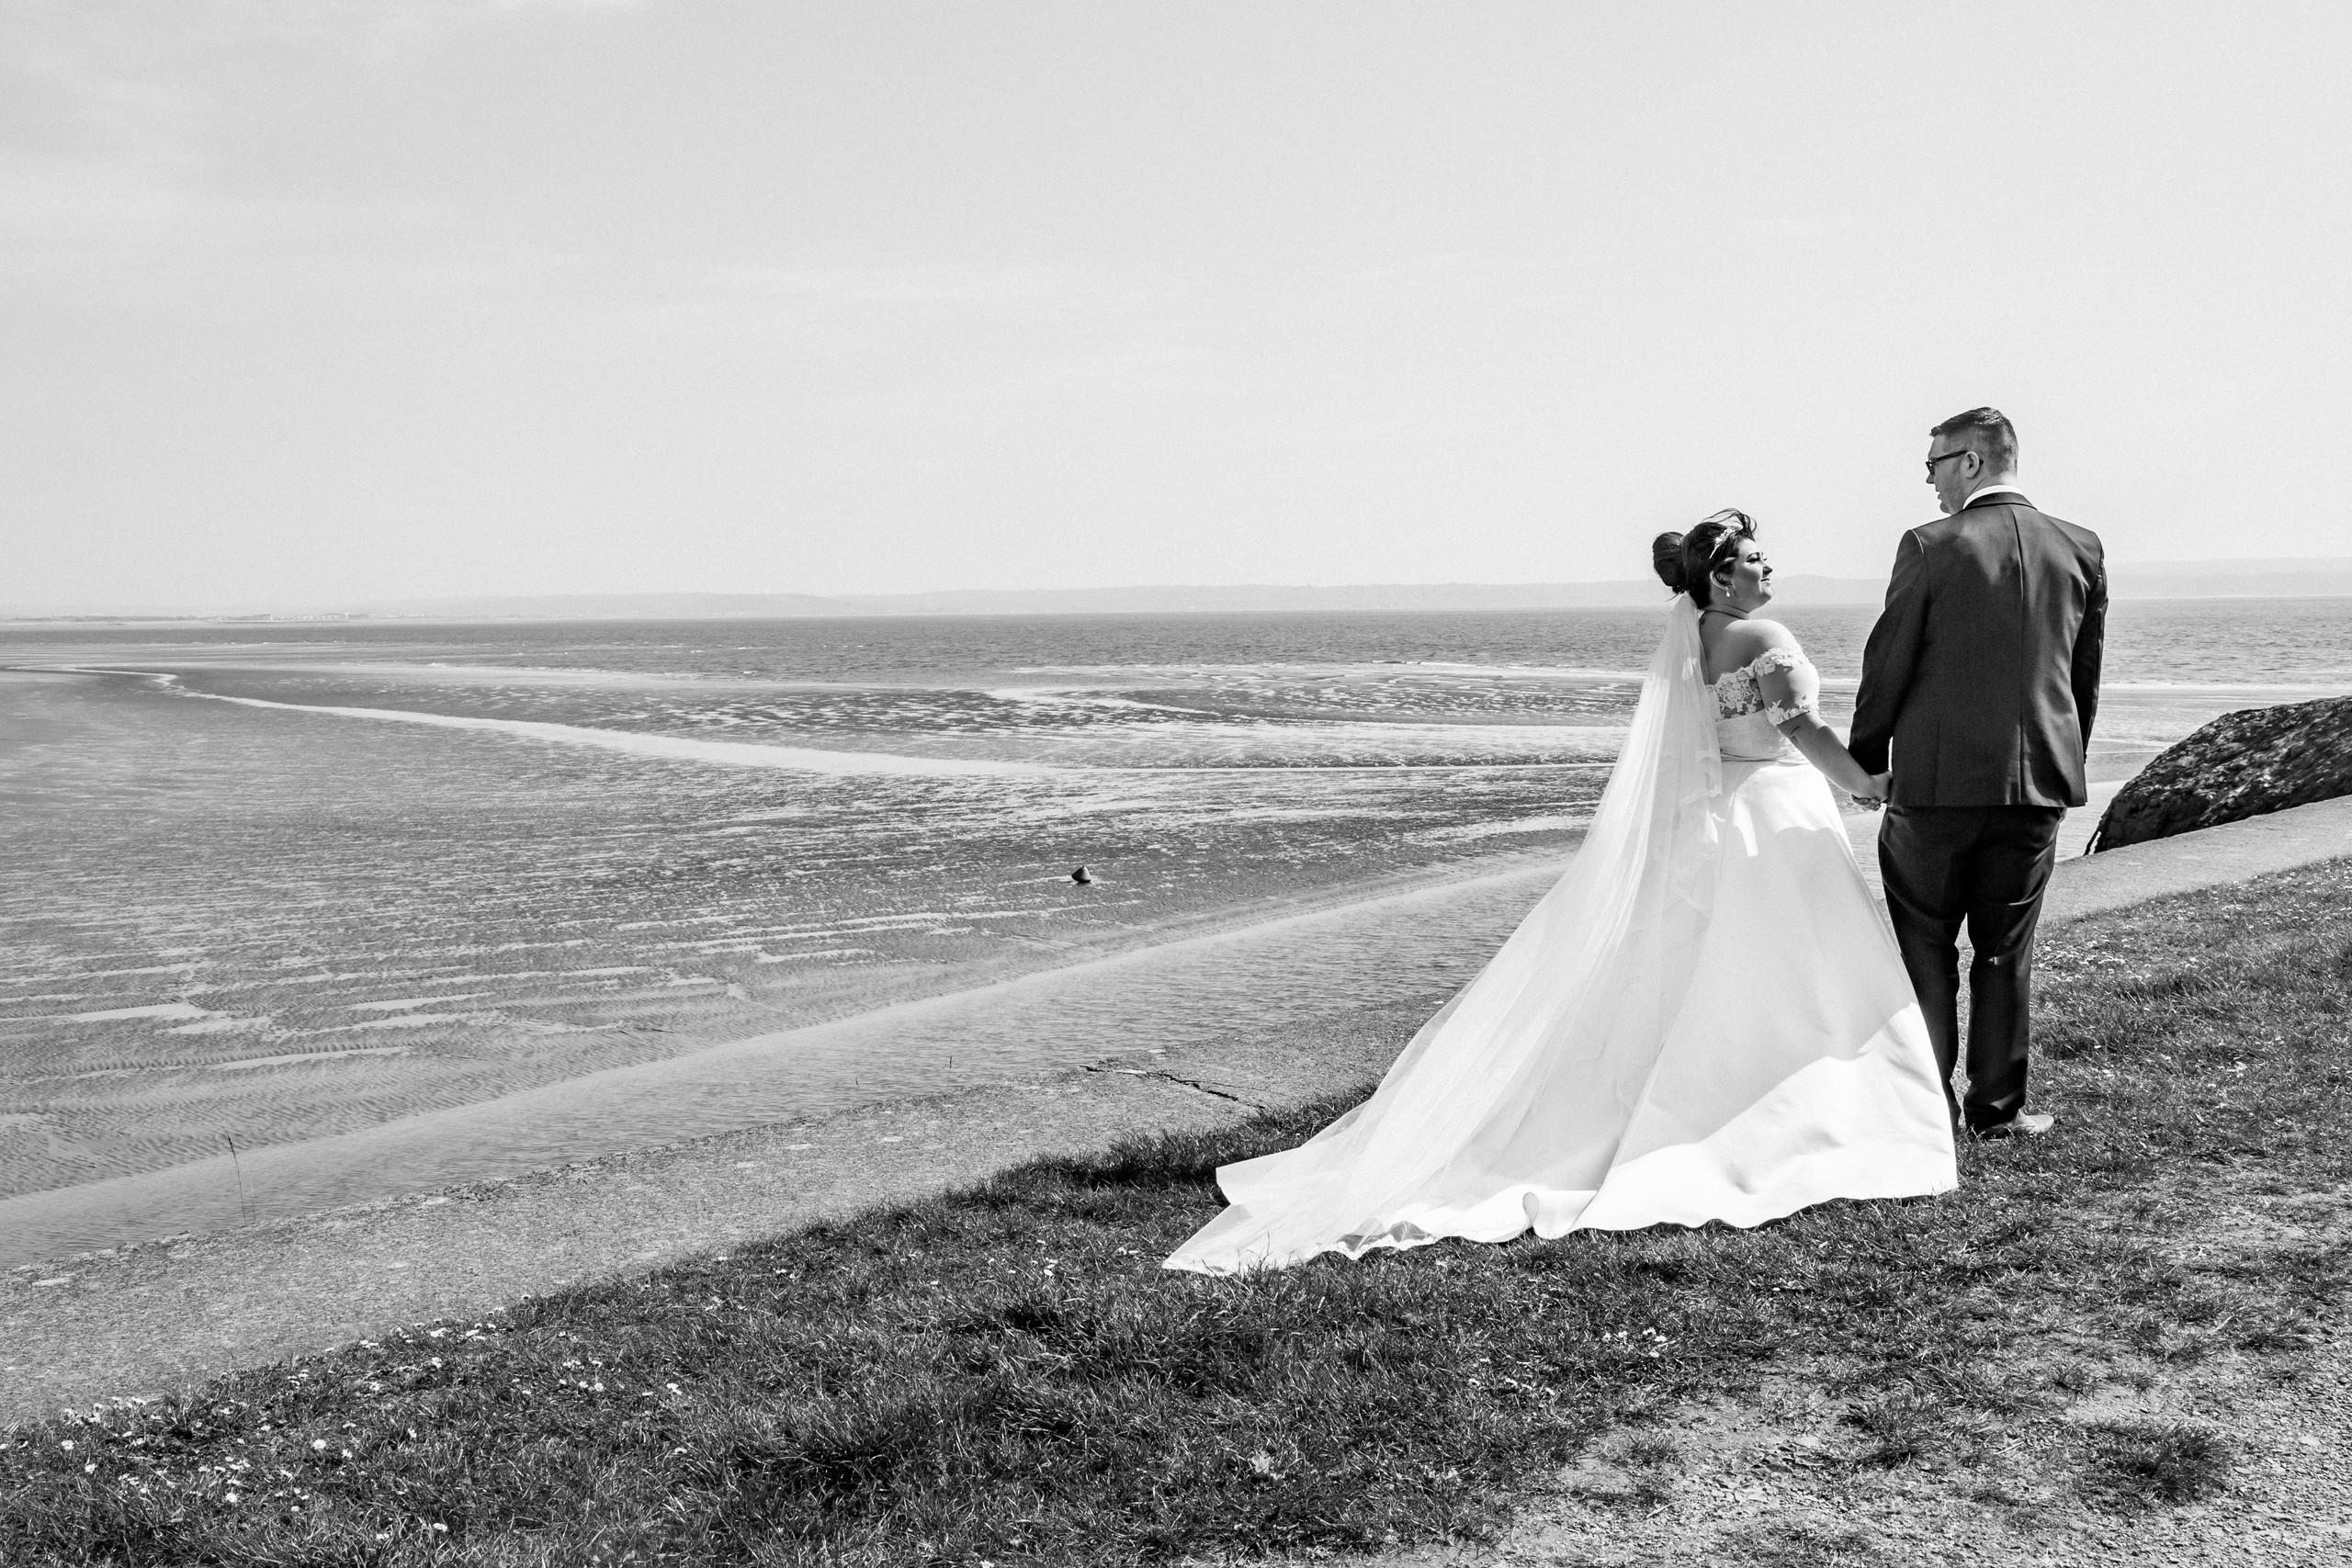 Seaside and Beach Wedding Photography near the Gower and Swansea Beach